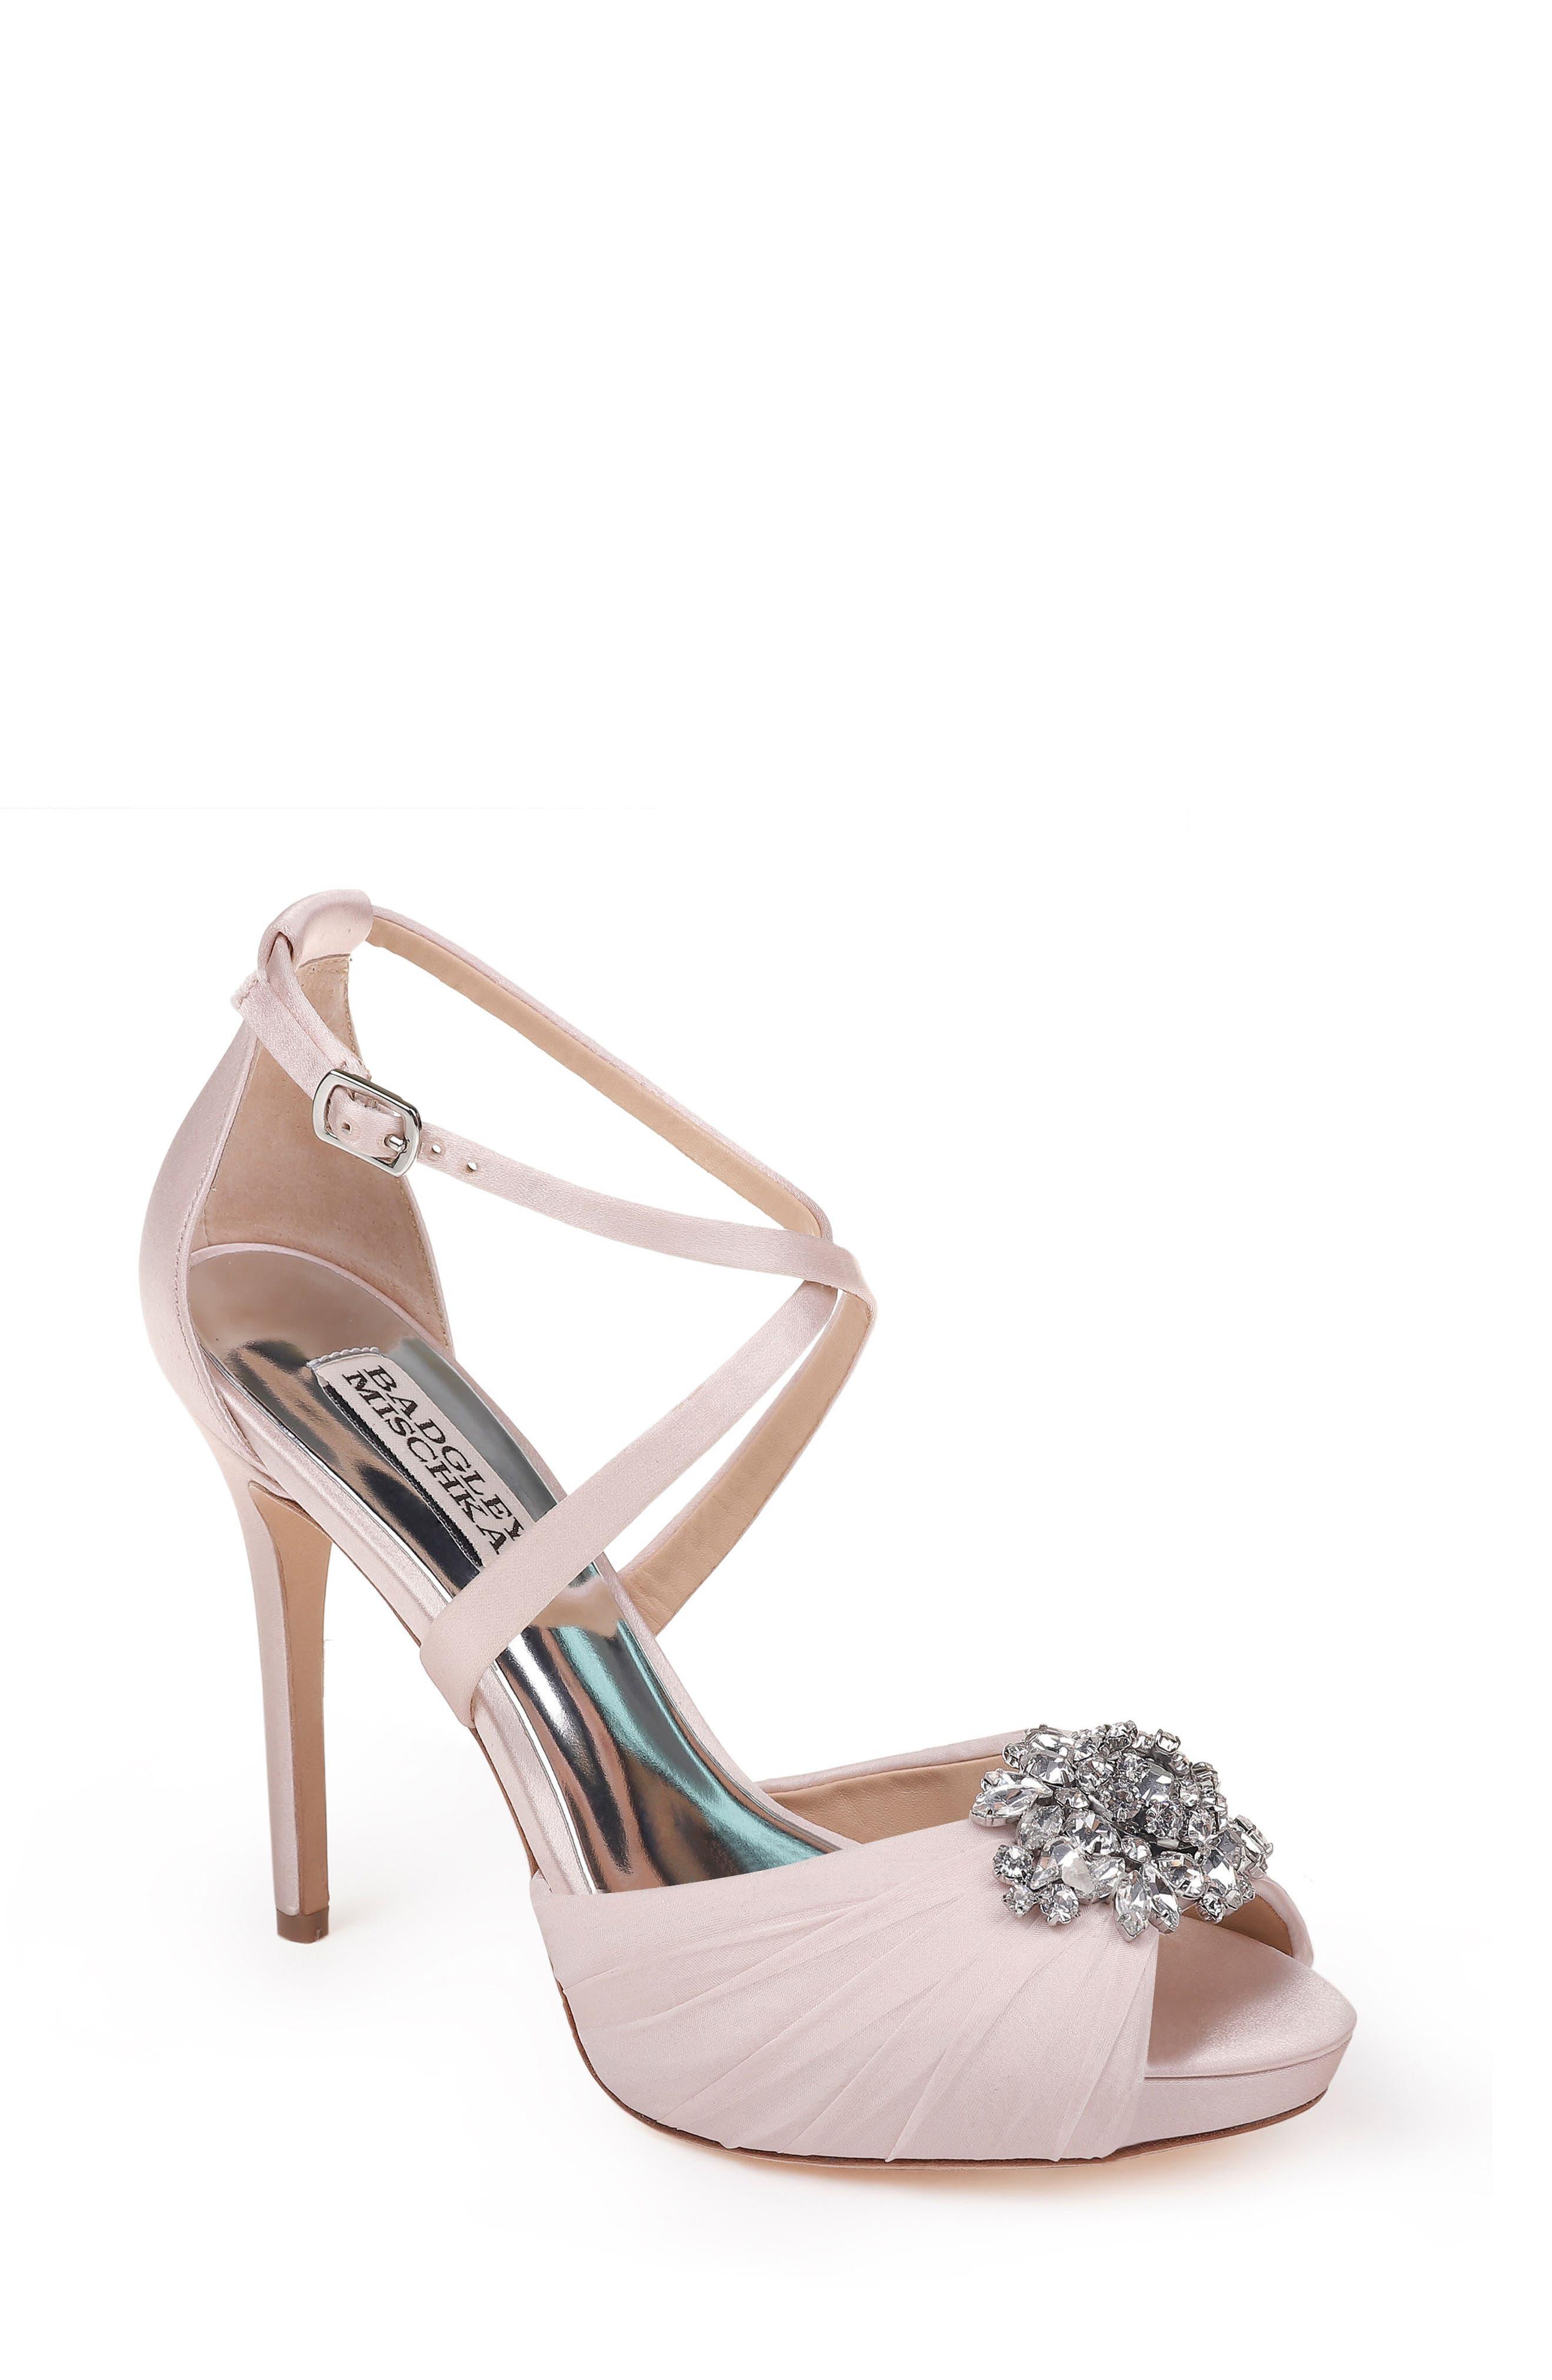 Sadie Strappy Sandal,                         Main,                         color, LIGHT PINK SATIN